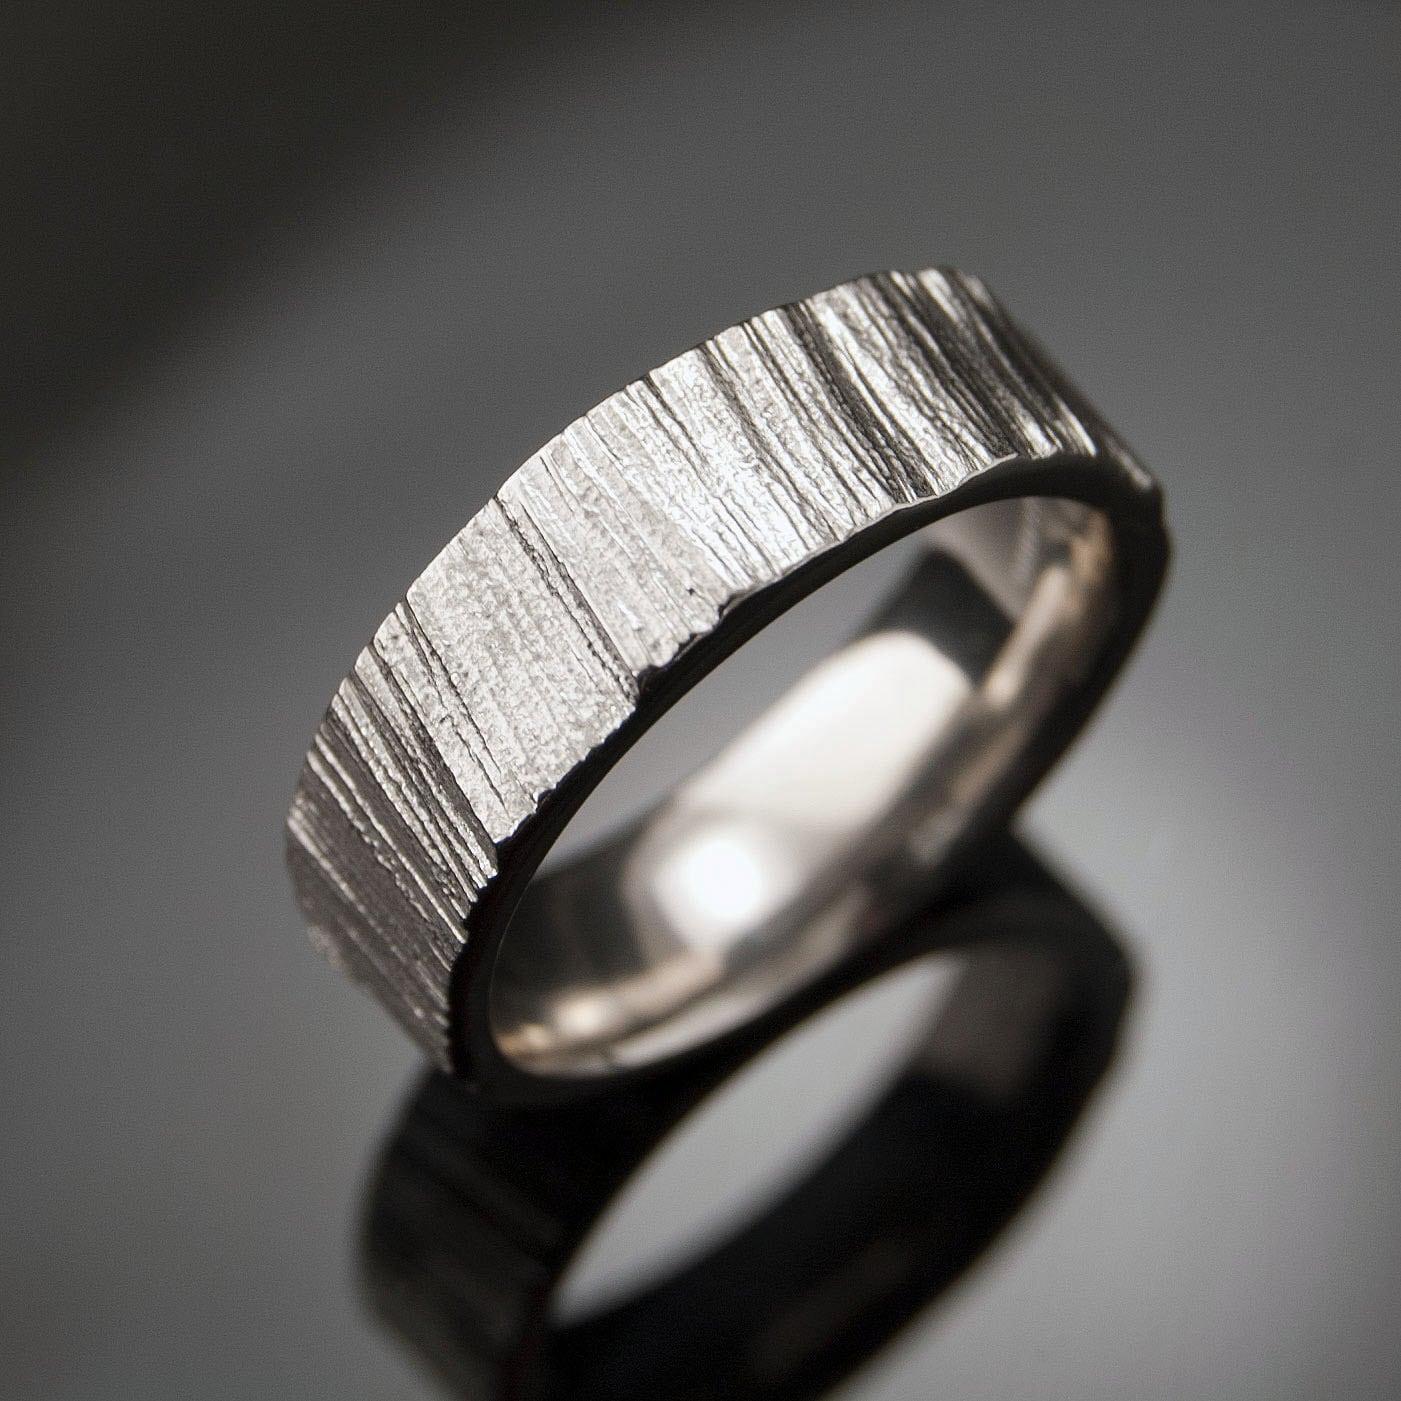 saw cut wedding band ring textured etsy mens wedding bands zoom